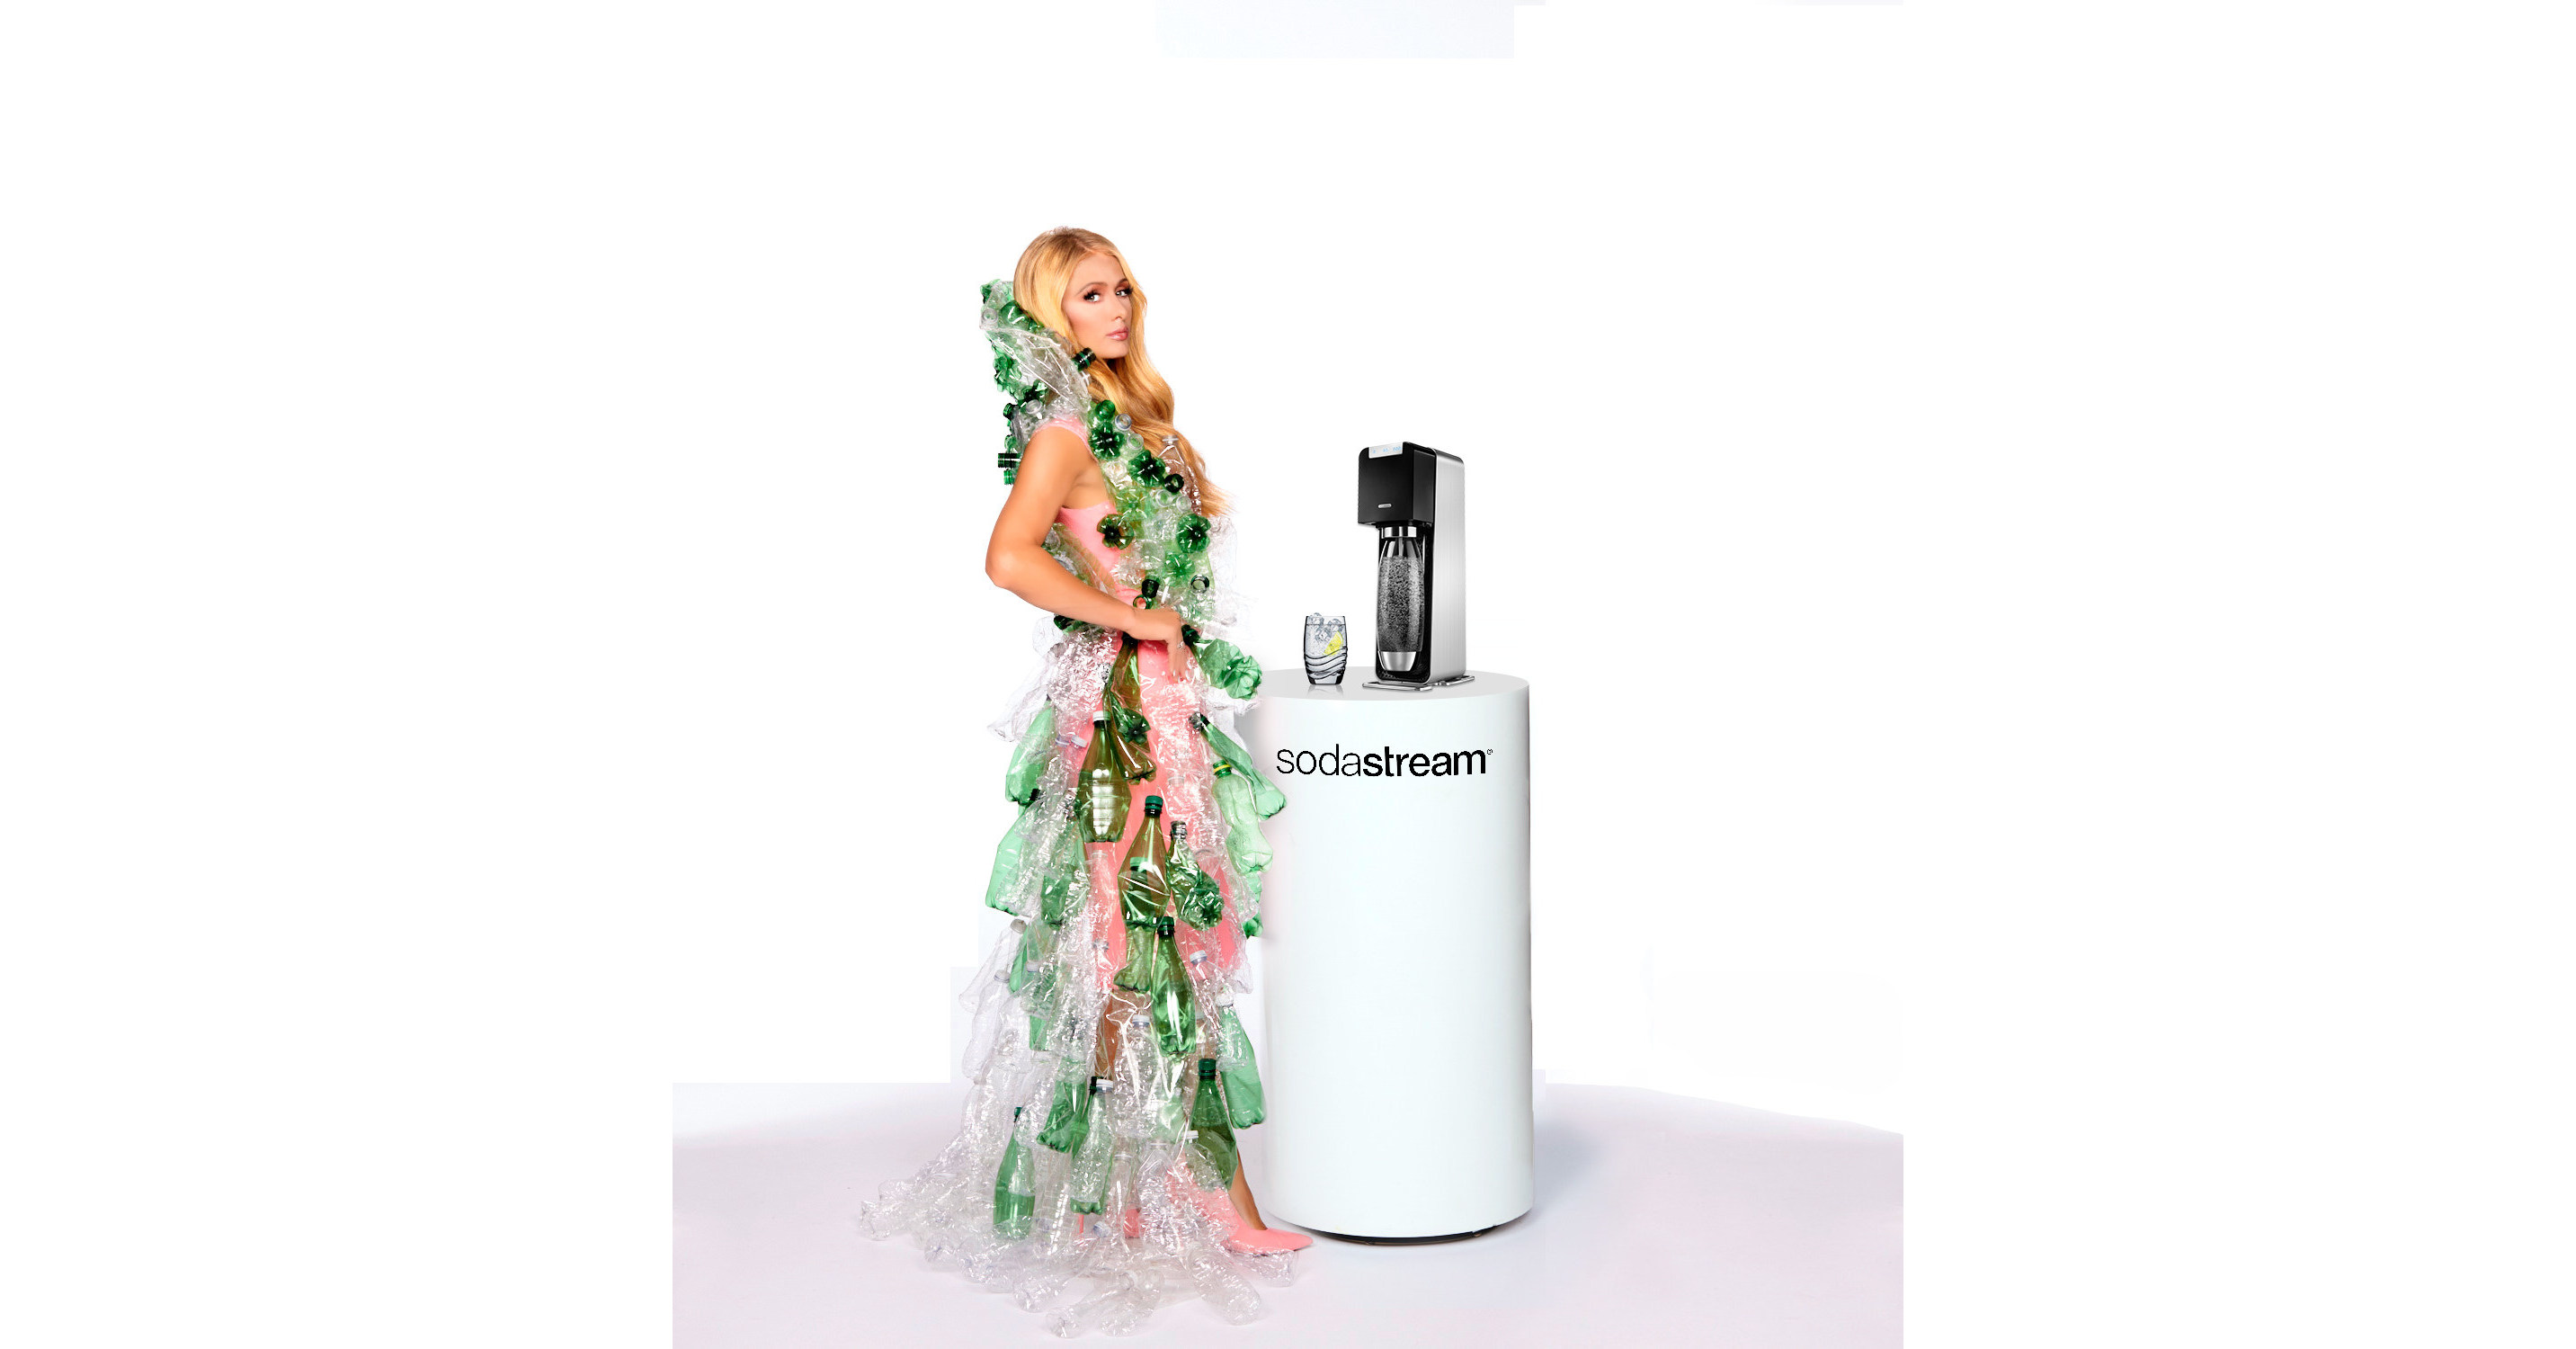 Sodastream Reveals April Fools' Day Prank With Paris Hilton photo